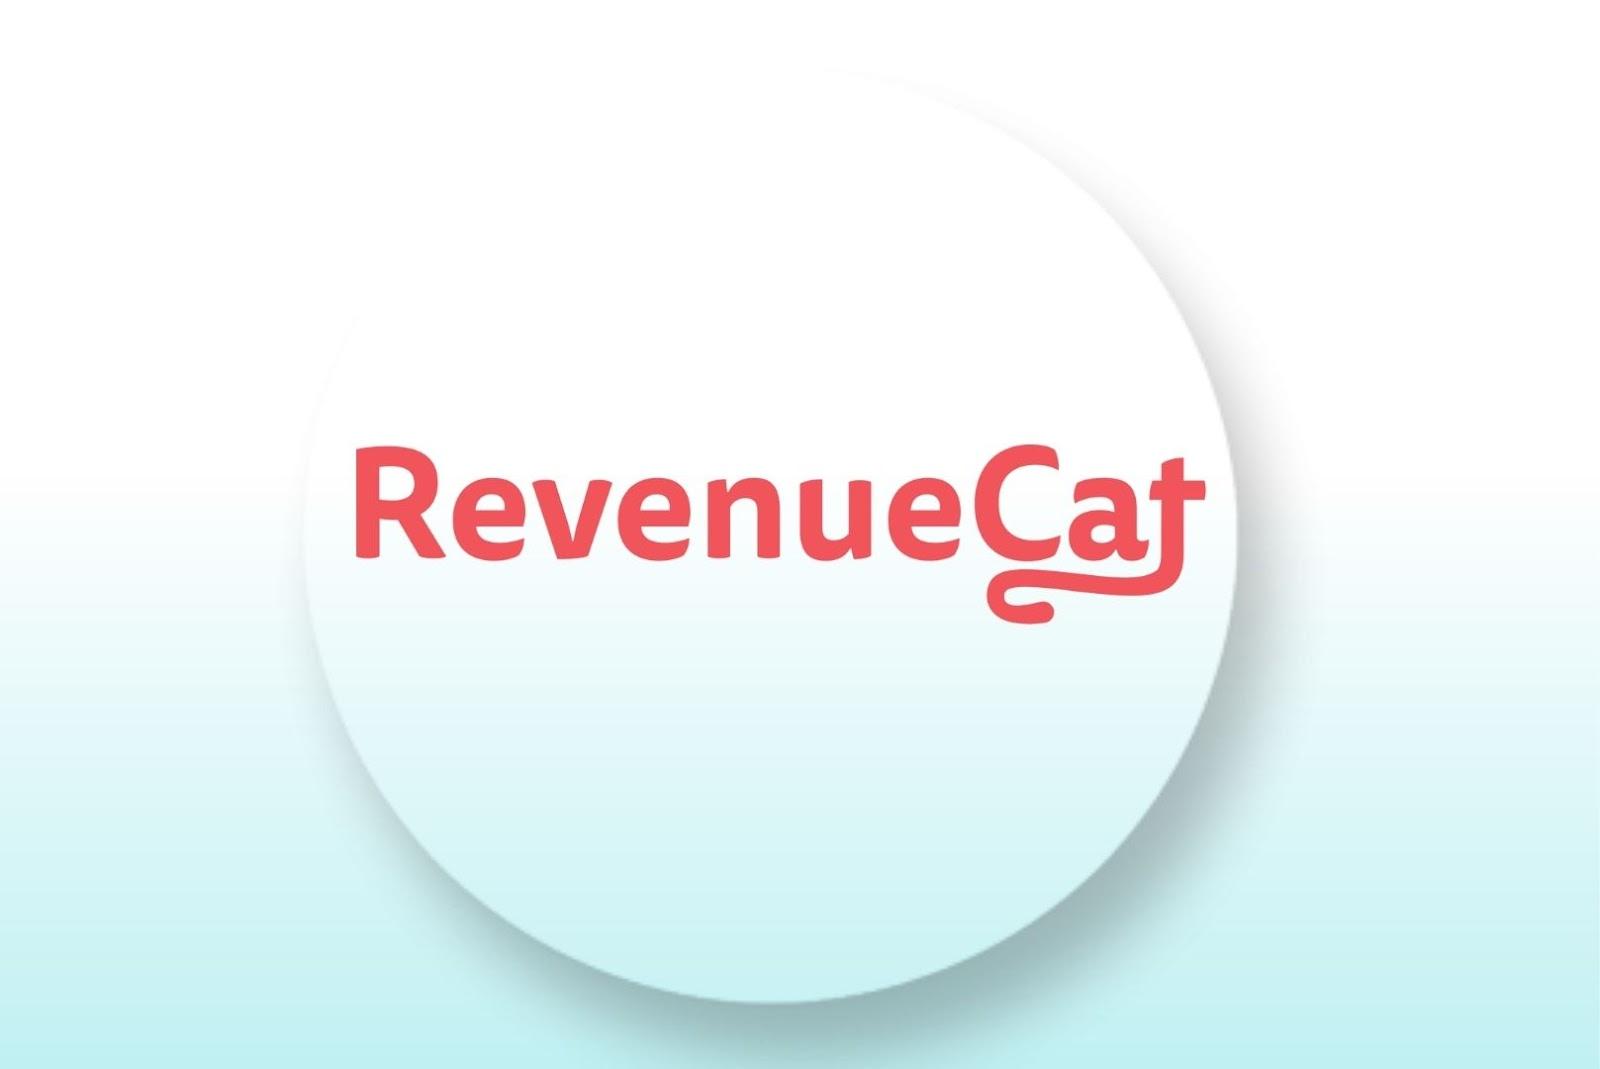 Revenue Cat flutter app development tools